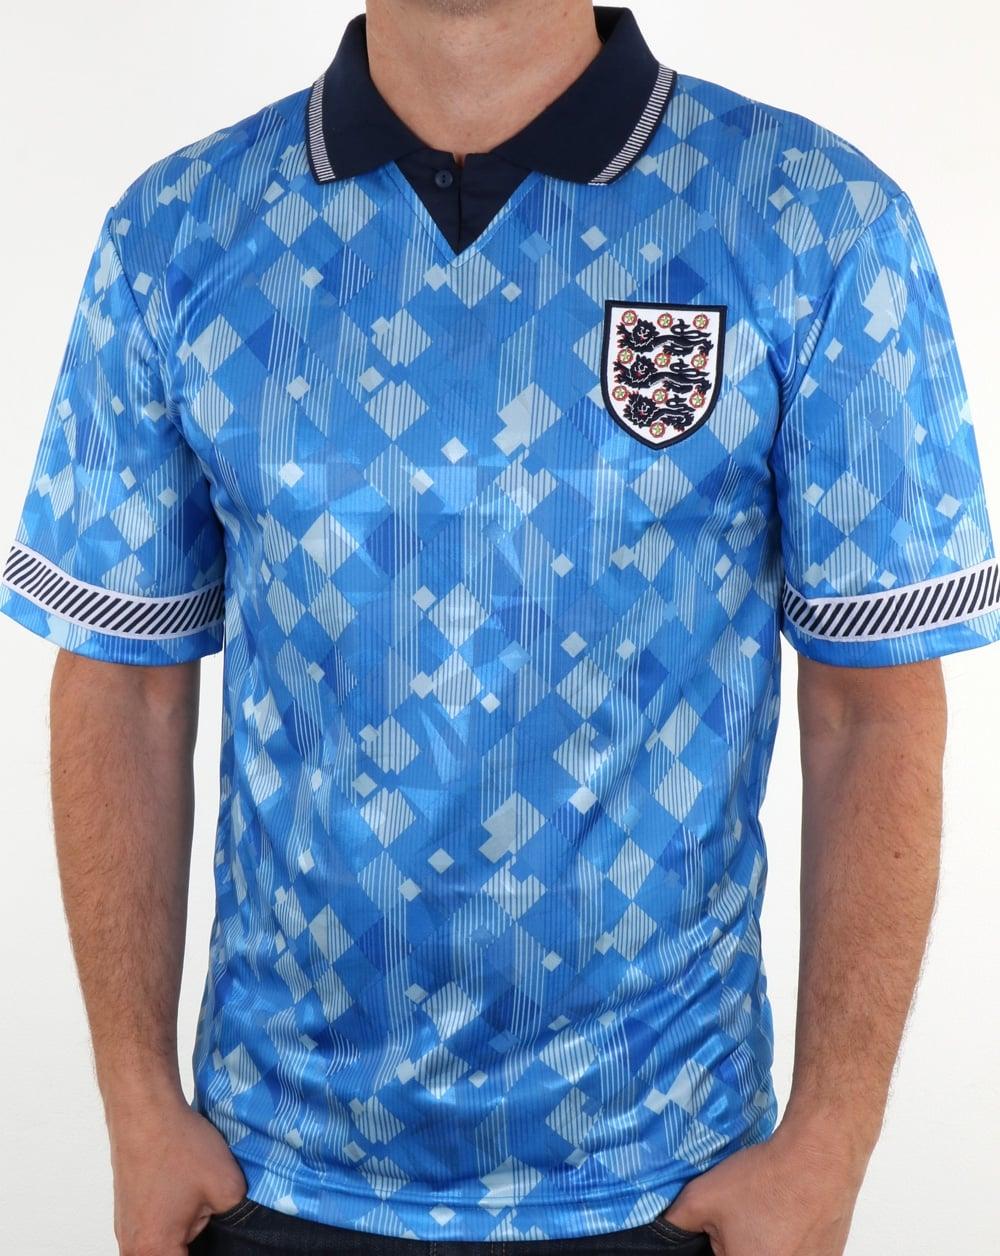 80s Casual Classics 80s Casual Classics England 1990 Retro Football Shirt  Blue 5bd5b2598